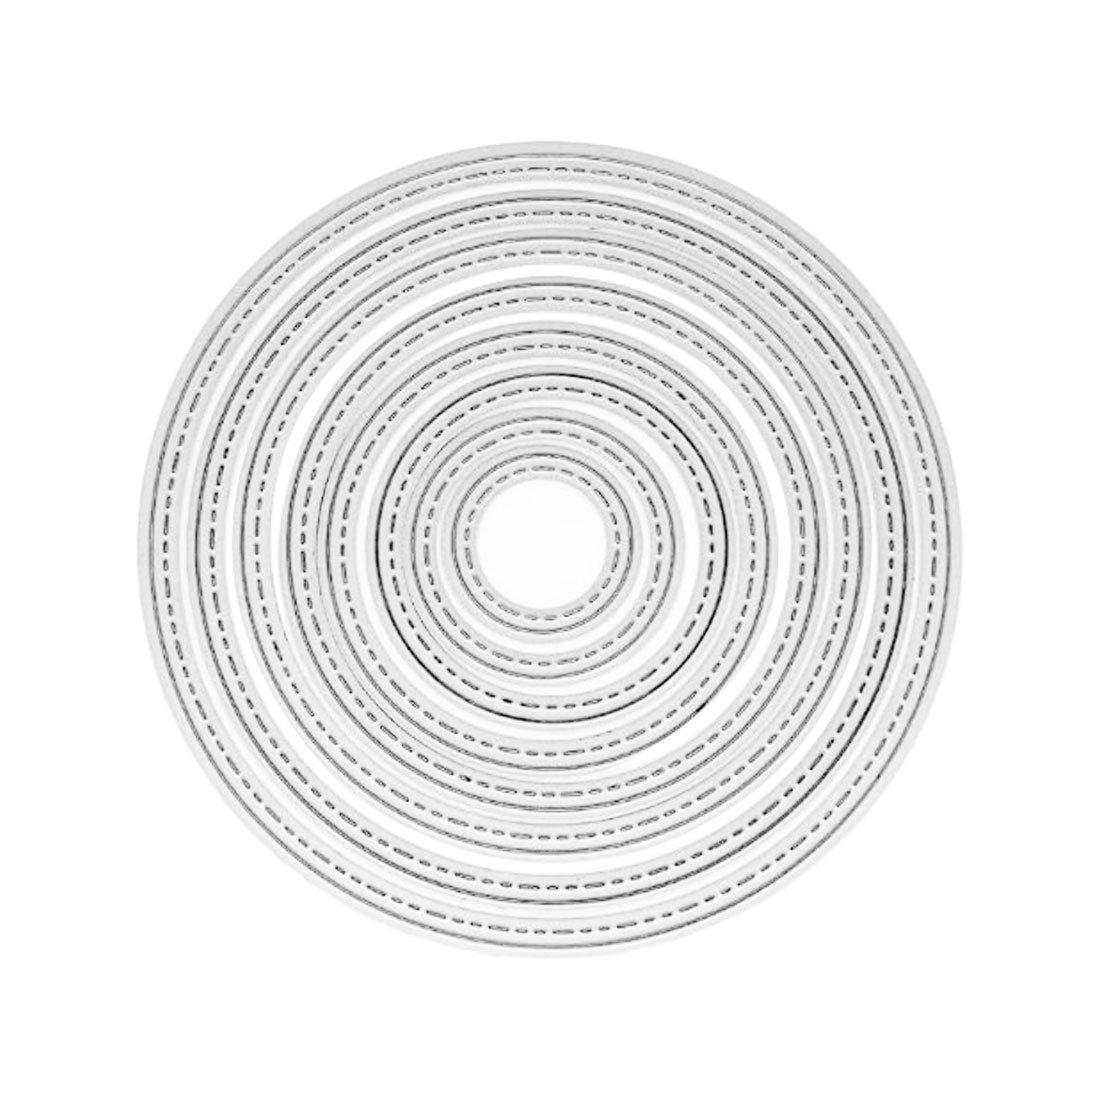 8Pcs Circle Metal Cutting Dies Stencils Decoration Die Cuts Embossing Folder Template Craft Luwu-Store